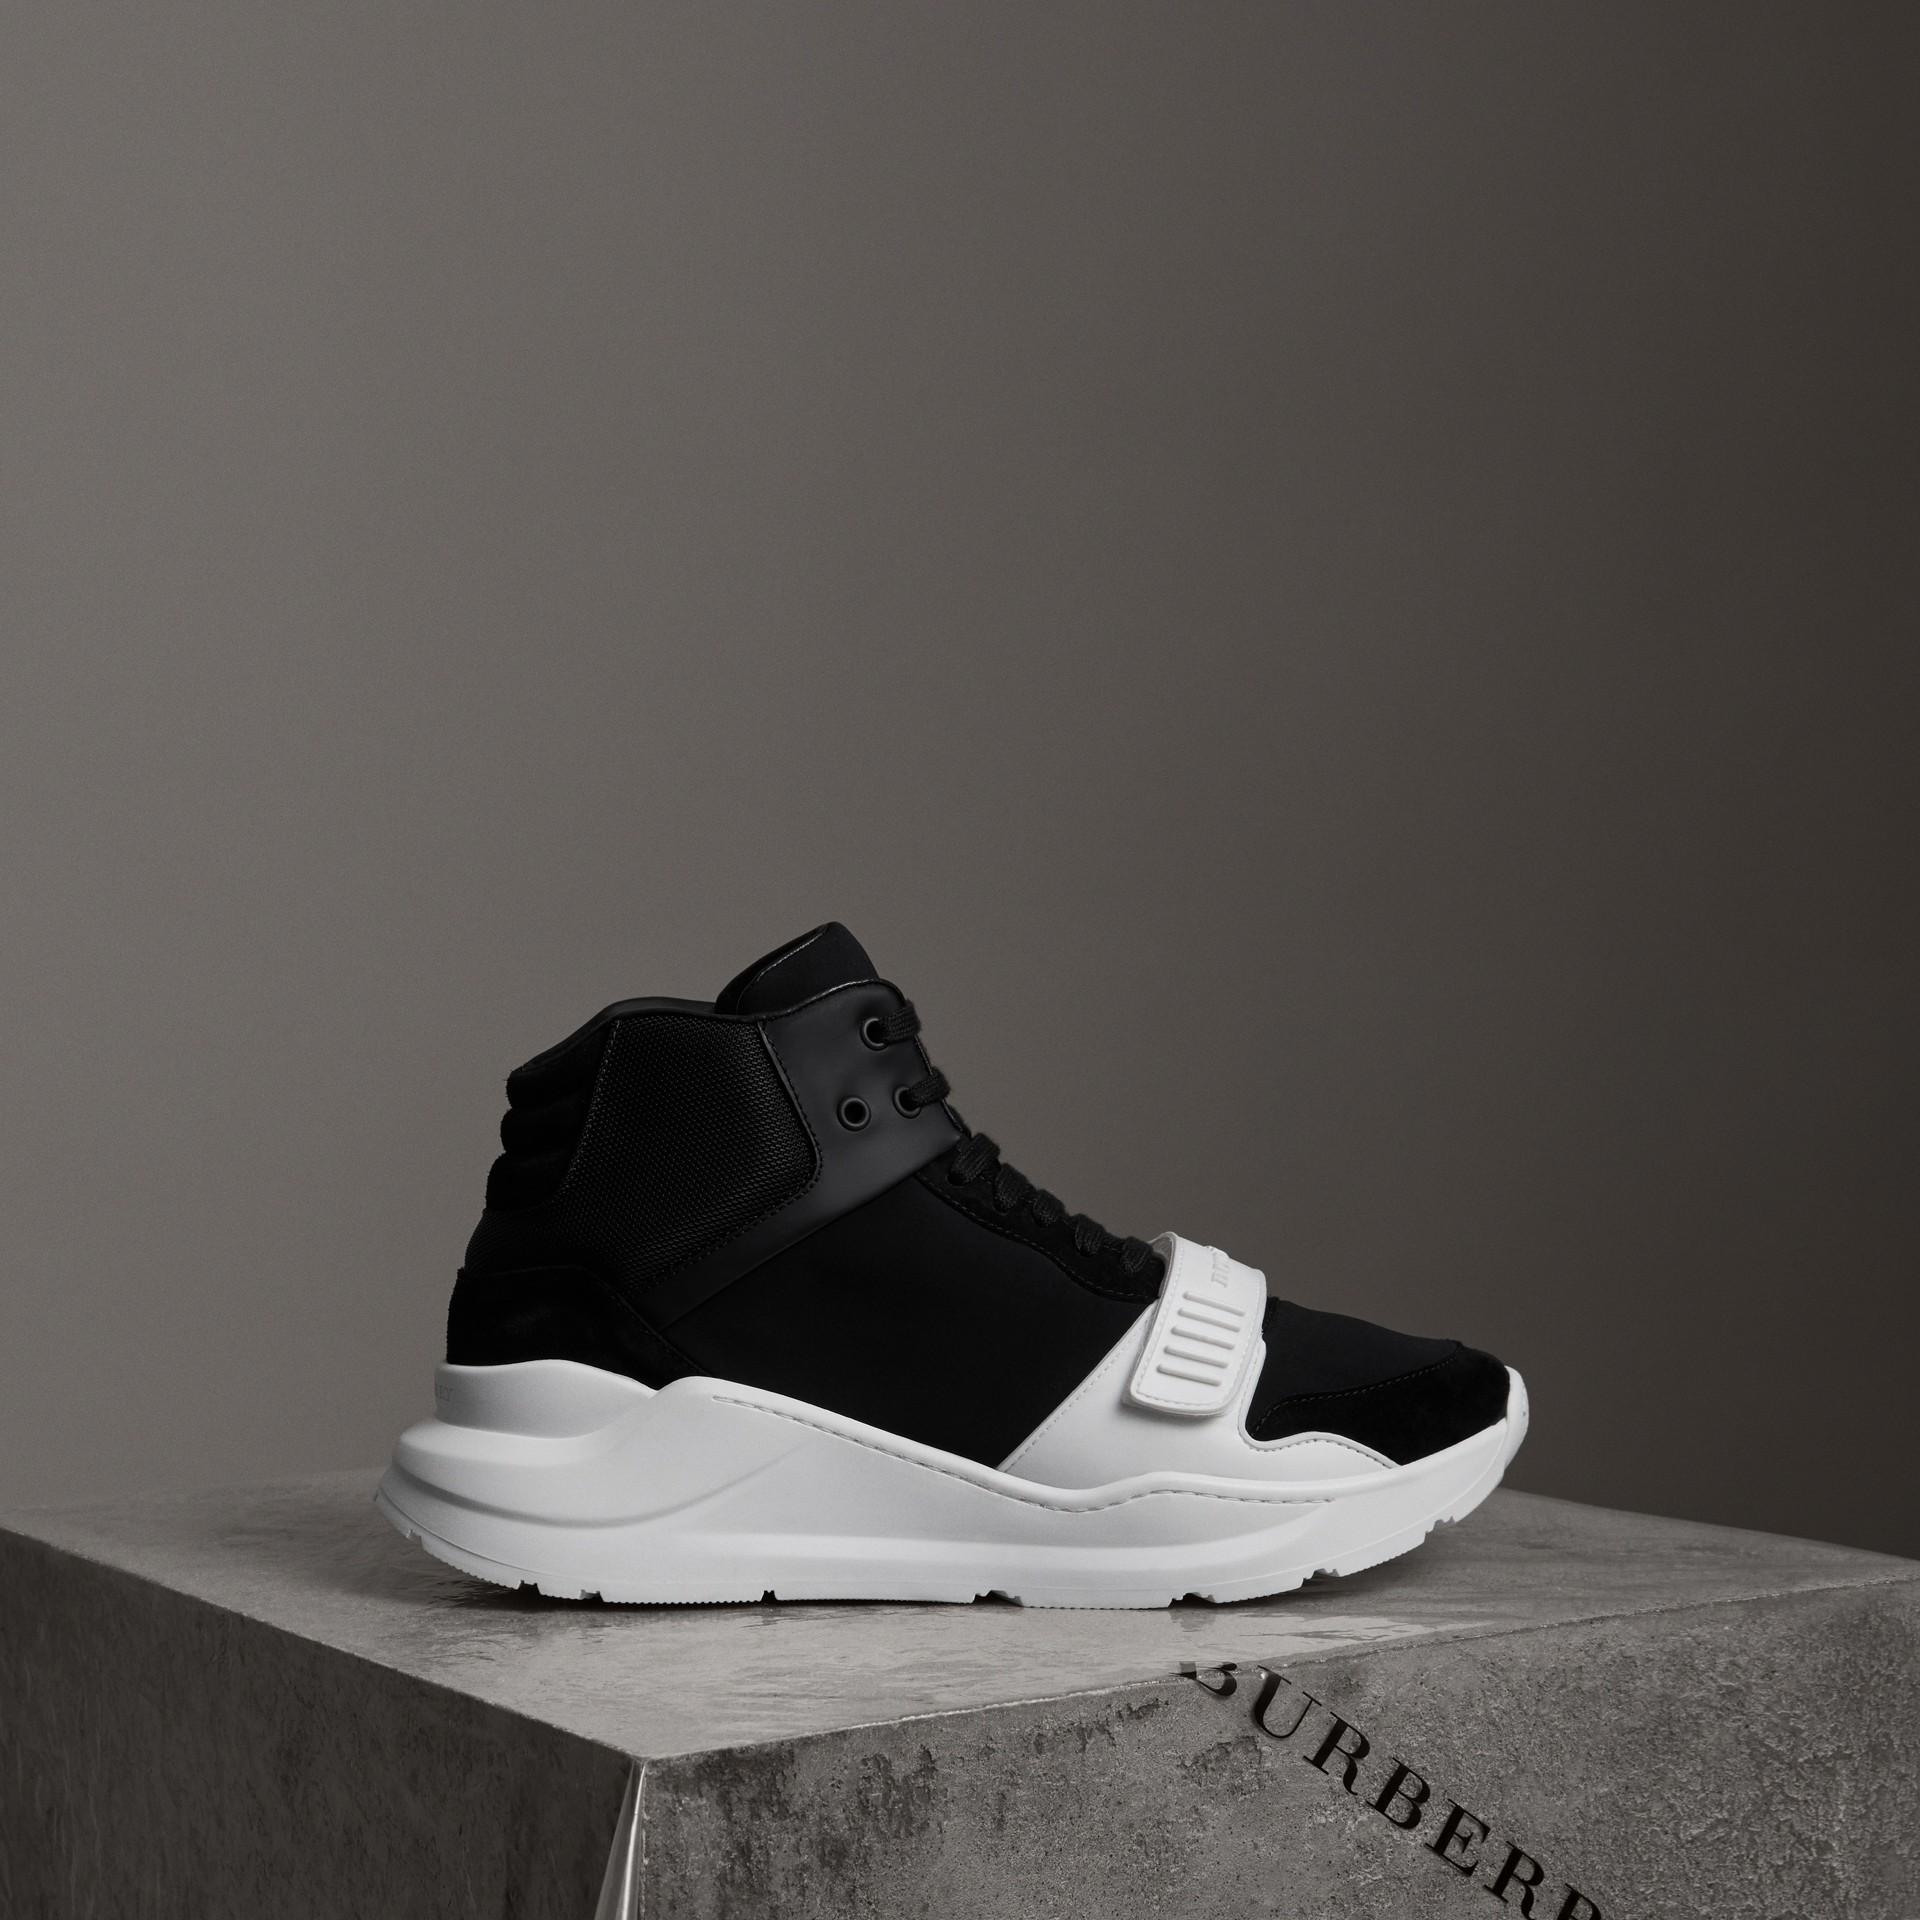 Suede and Neoprene High-top Sneakers in Black - Women | Burberry - gallery image 0